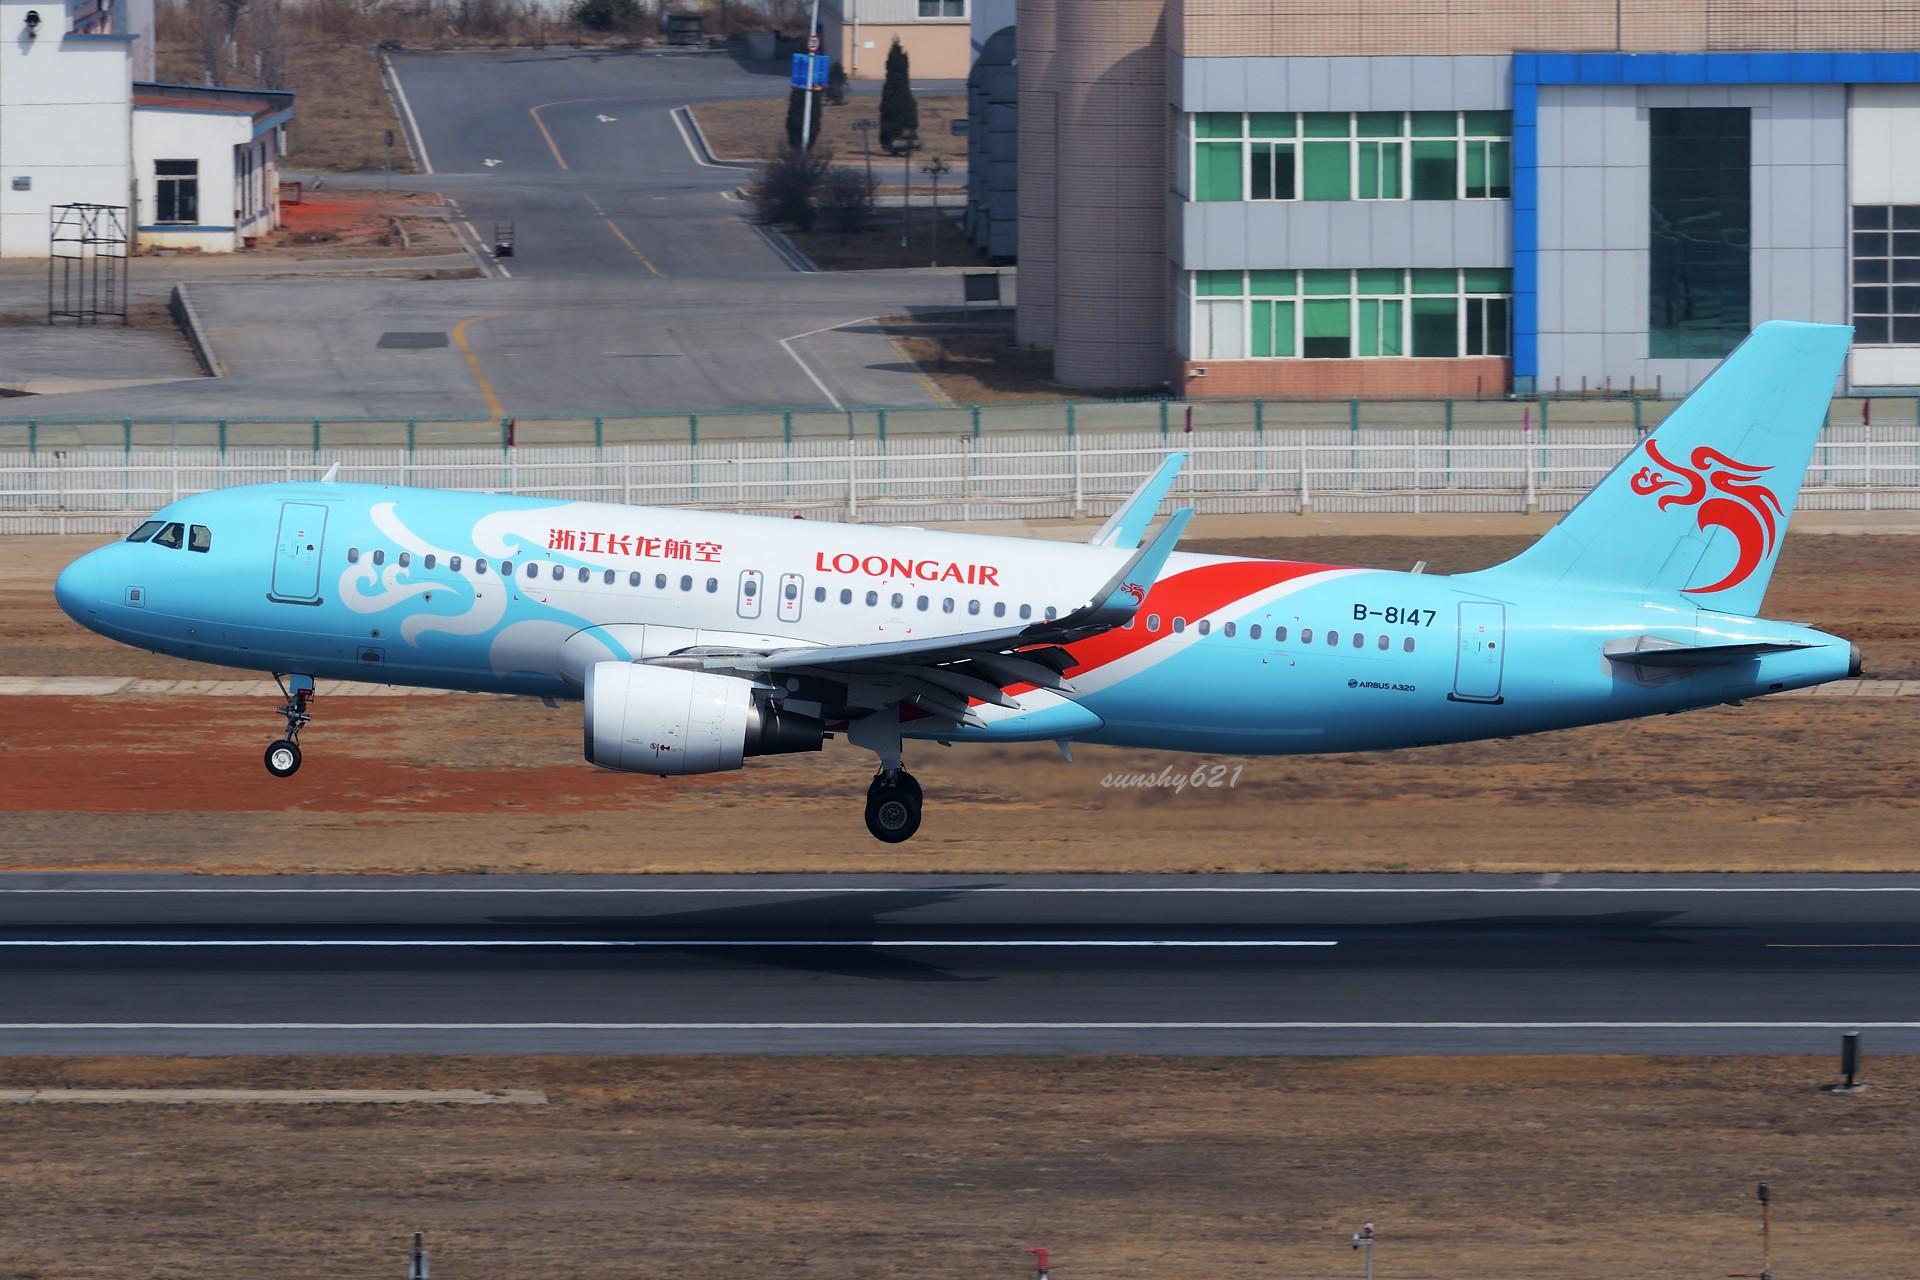 Re:[原创]★[DLC]一点有趣的事情(持续更新中)★ AIRBUS A320-200 B-8147 中国大连国际机场